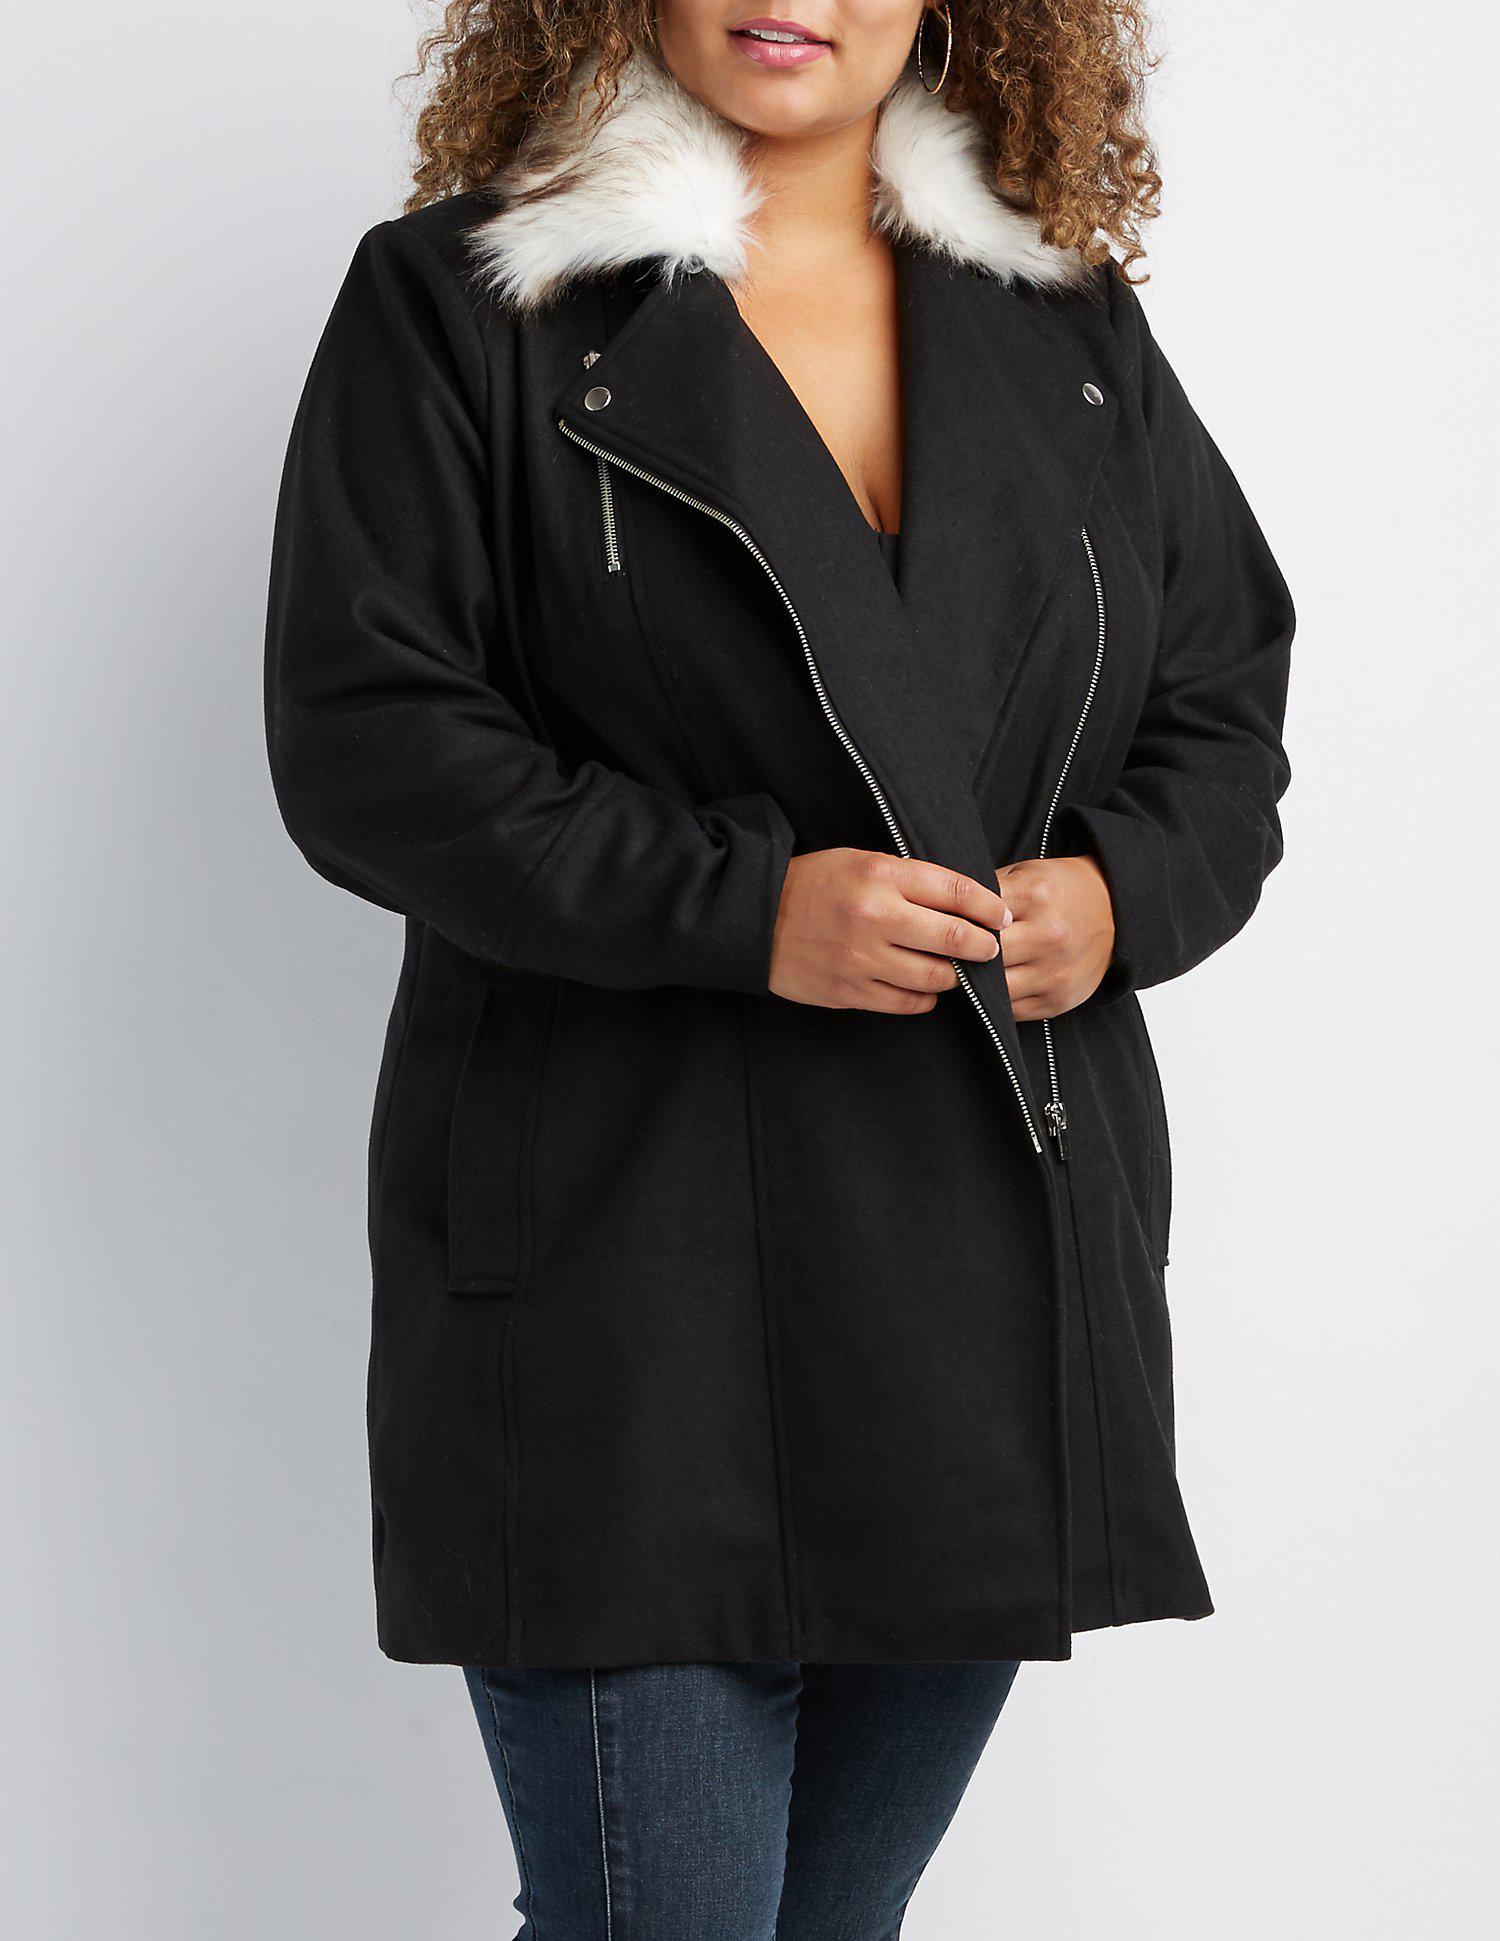 1bfb1da3491 Lyst - Charlotte Russe Plus Size Long Moto Faux Fur-trim Coat in Black